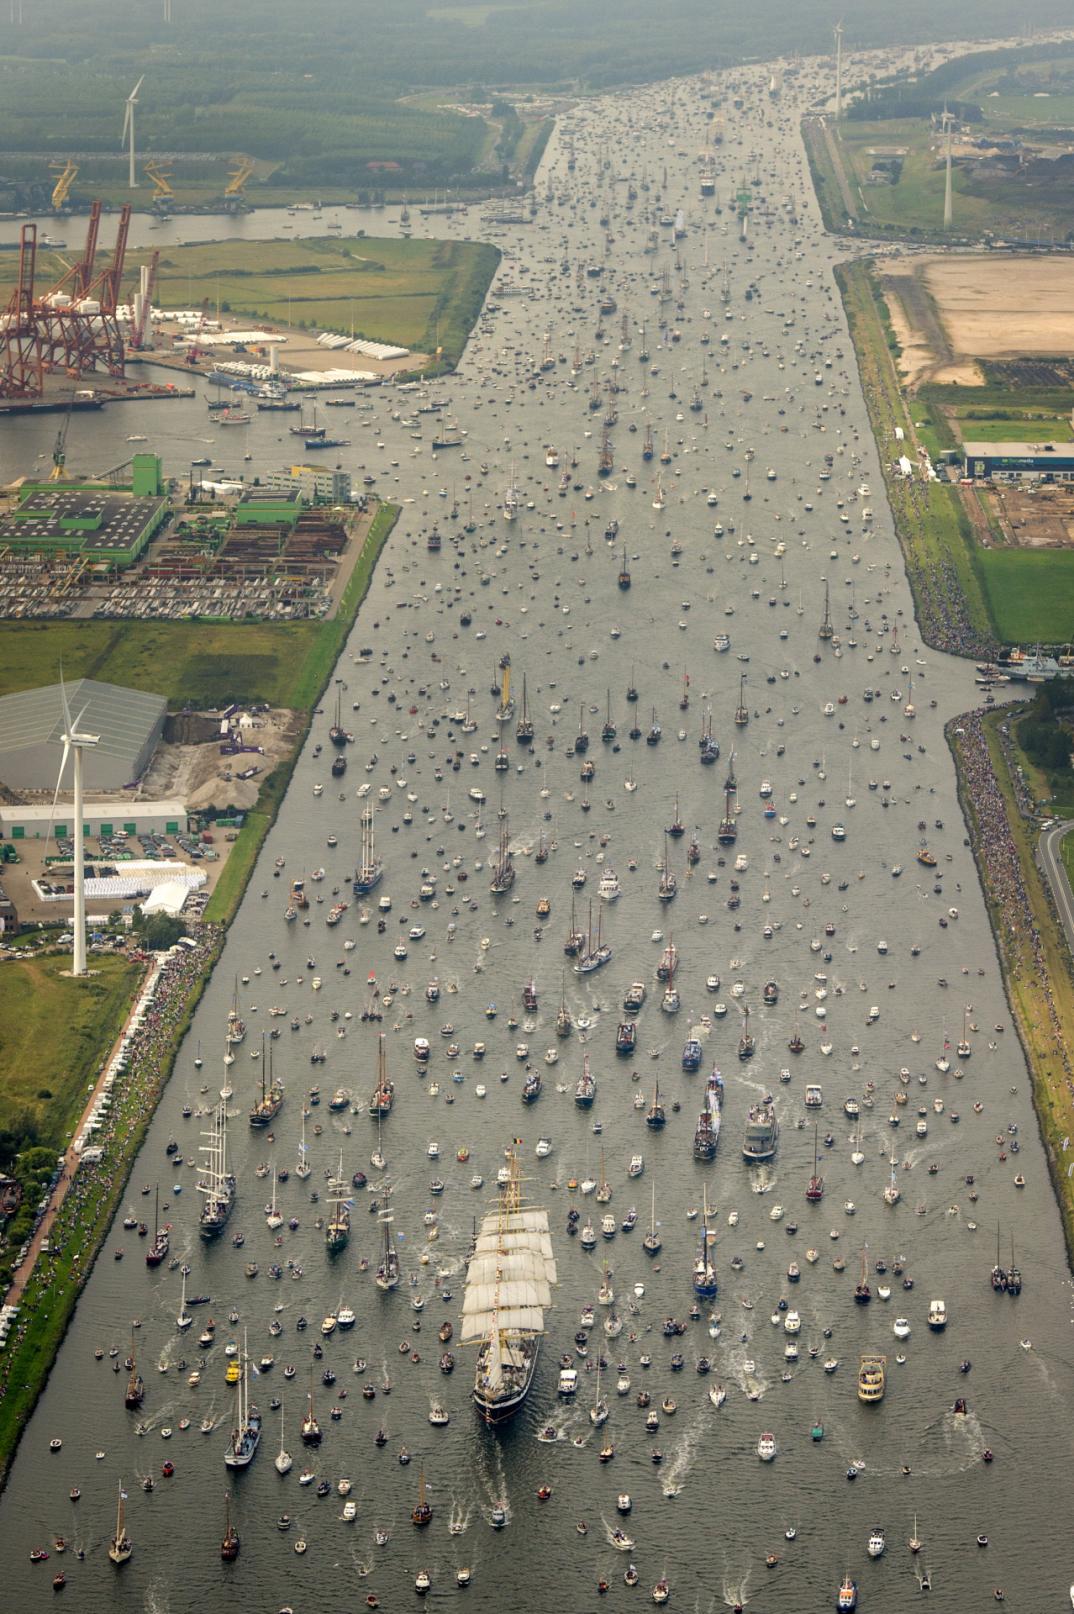 sail-amsterdam-2015-evento-nautico-paesi-bassi